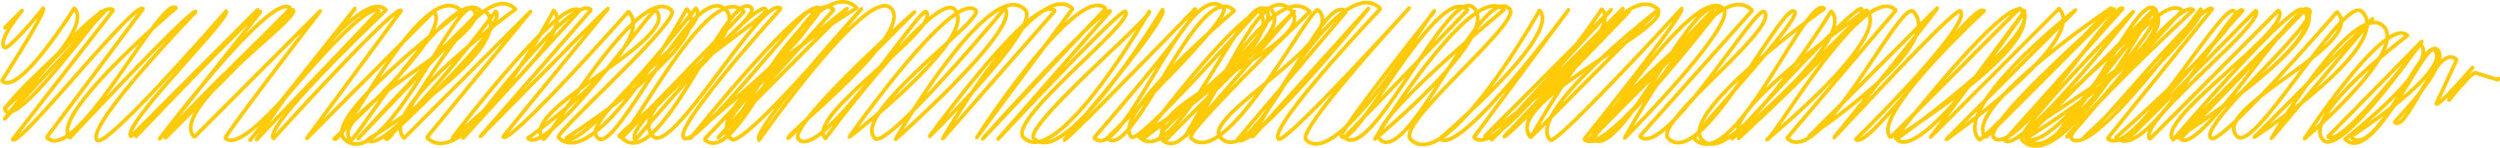 Yellow Pencil Scribble.jpg